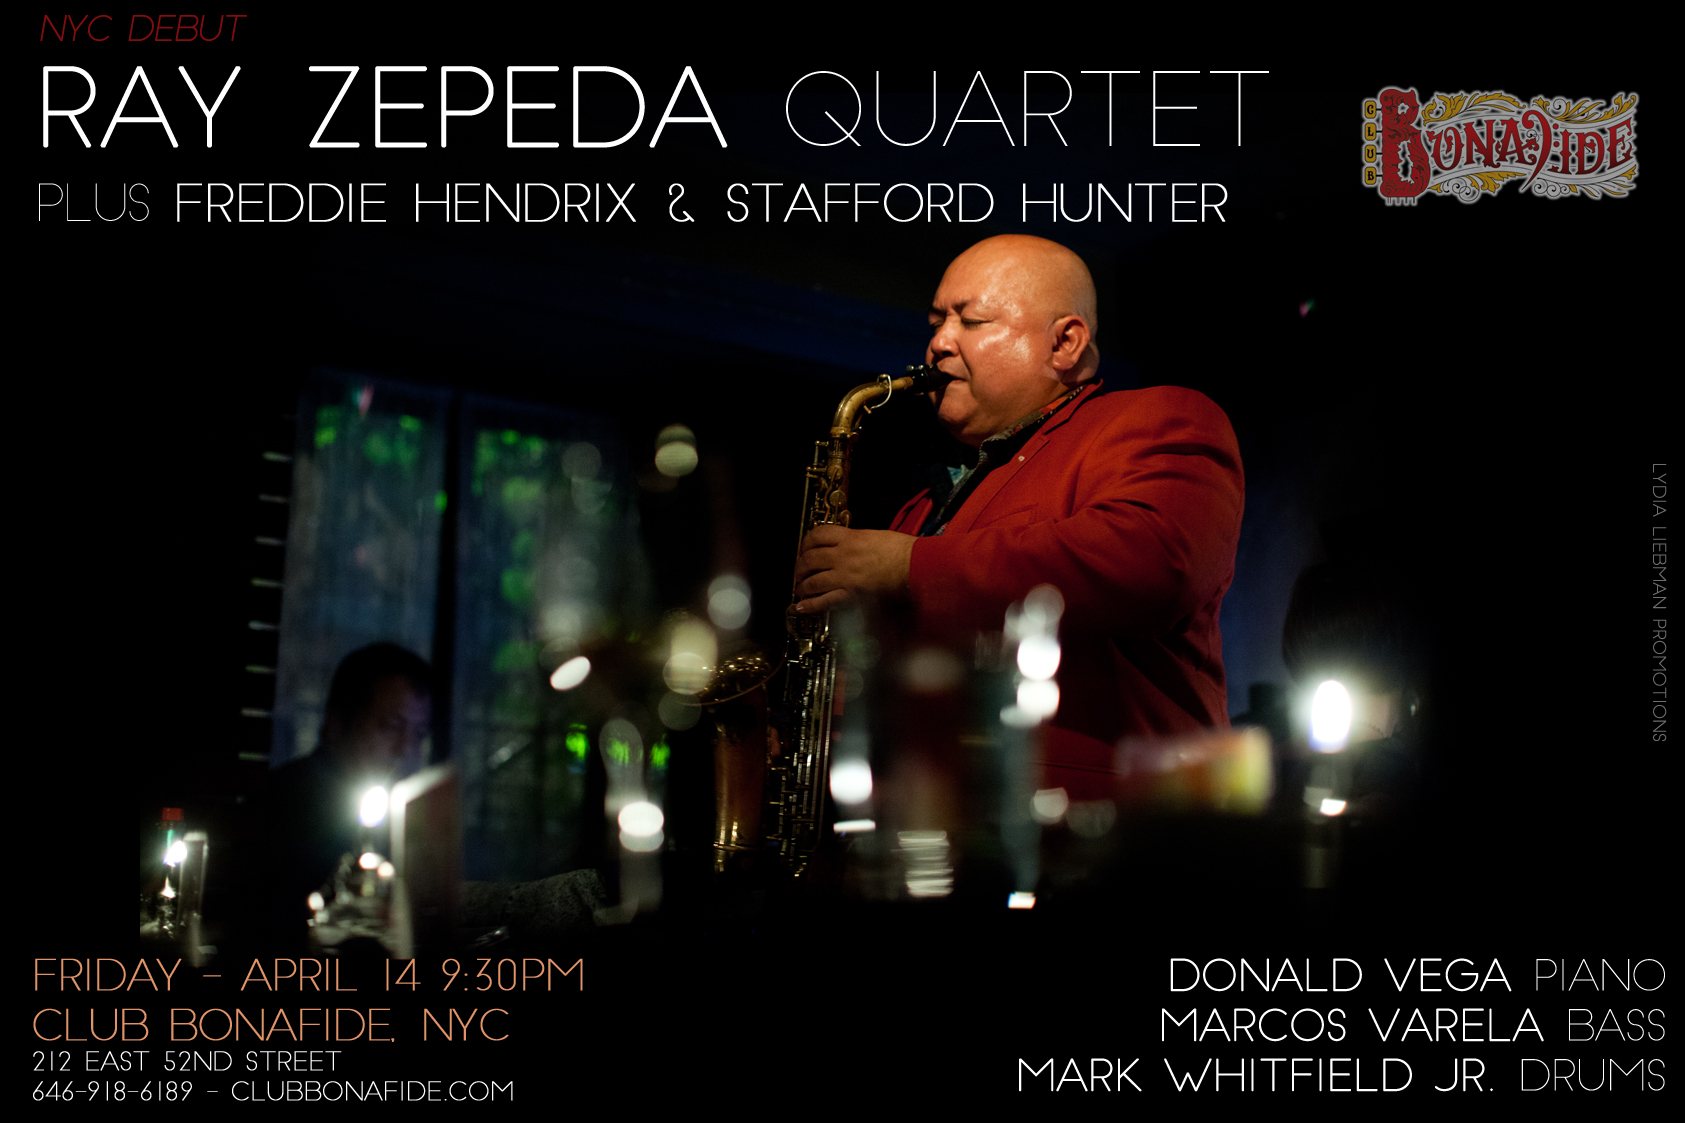 Ray Zepeda Quartet Makes Debut at Club Bonafide on April 14, 2017